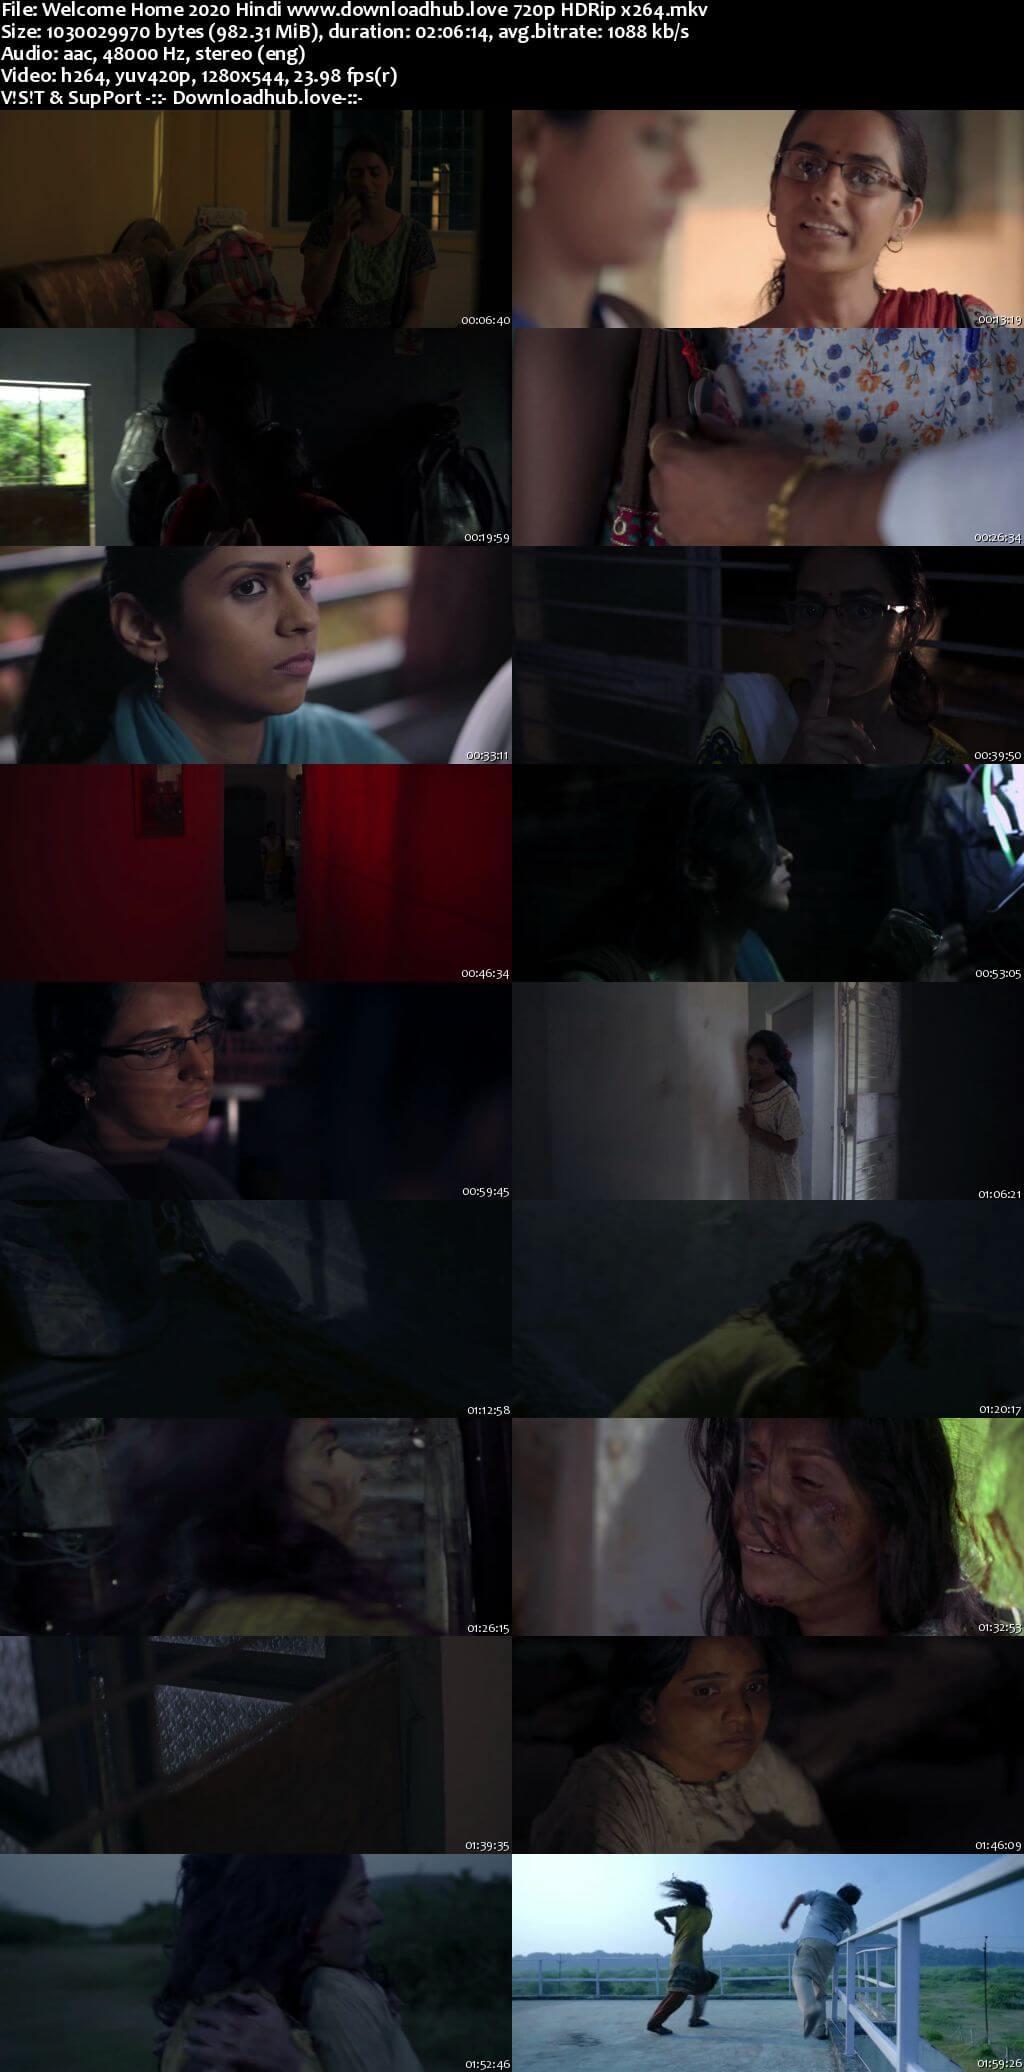 Welcome Home 2020 Hindi 720p HDRip x264